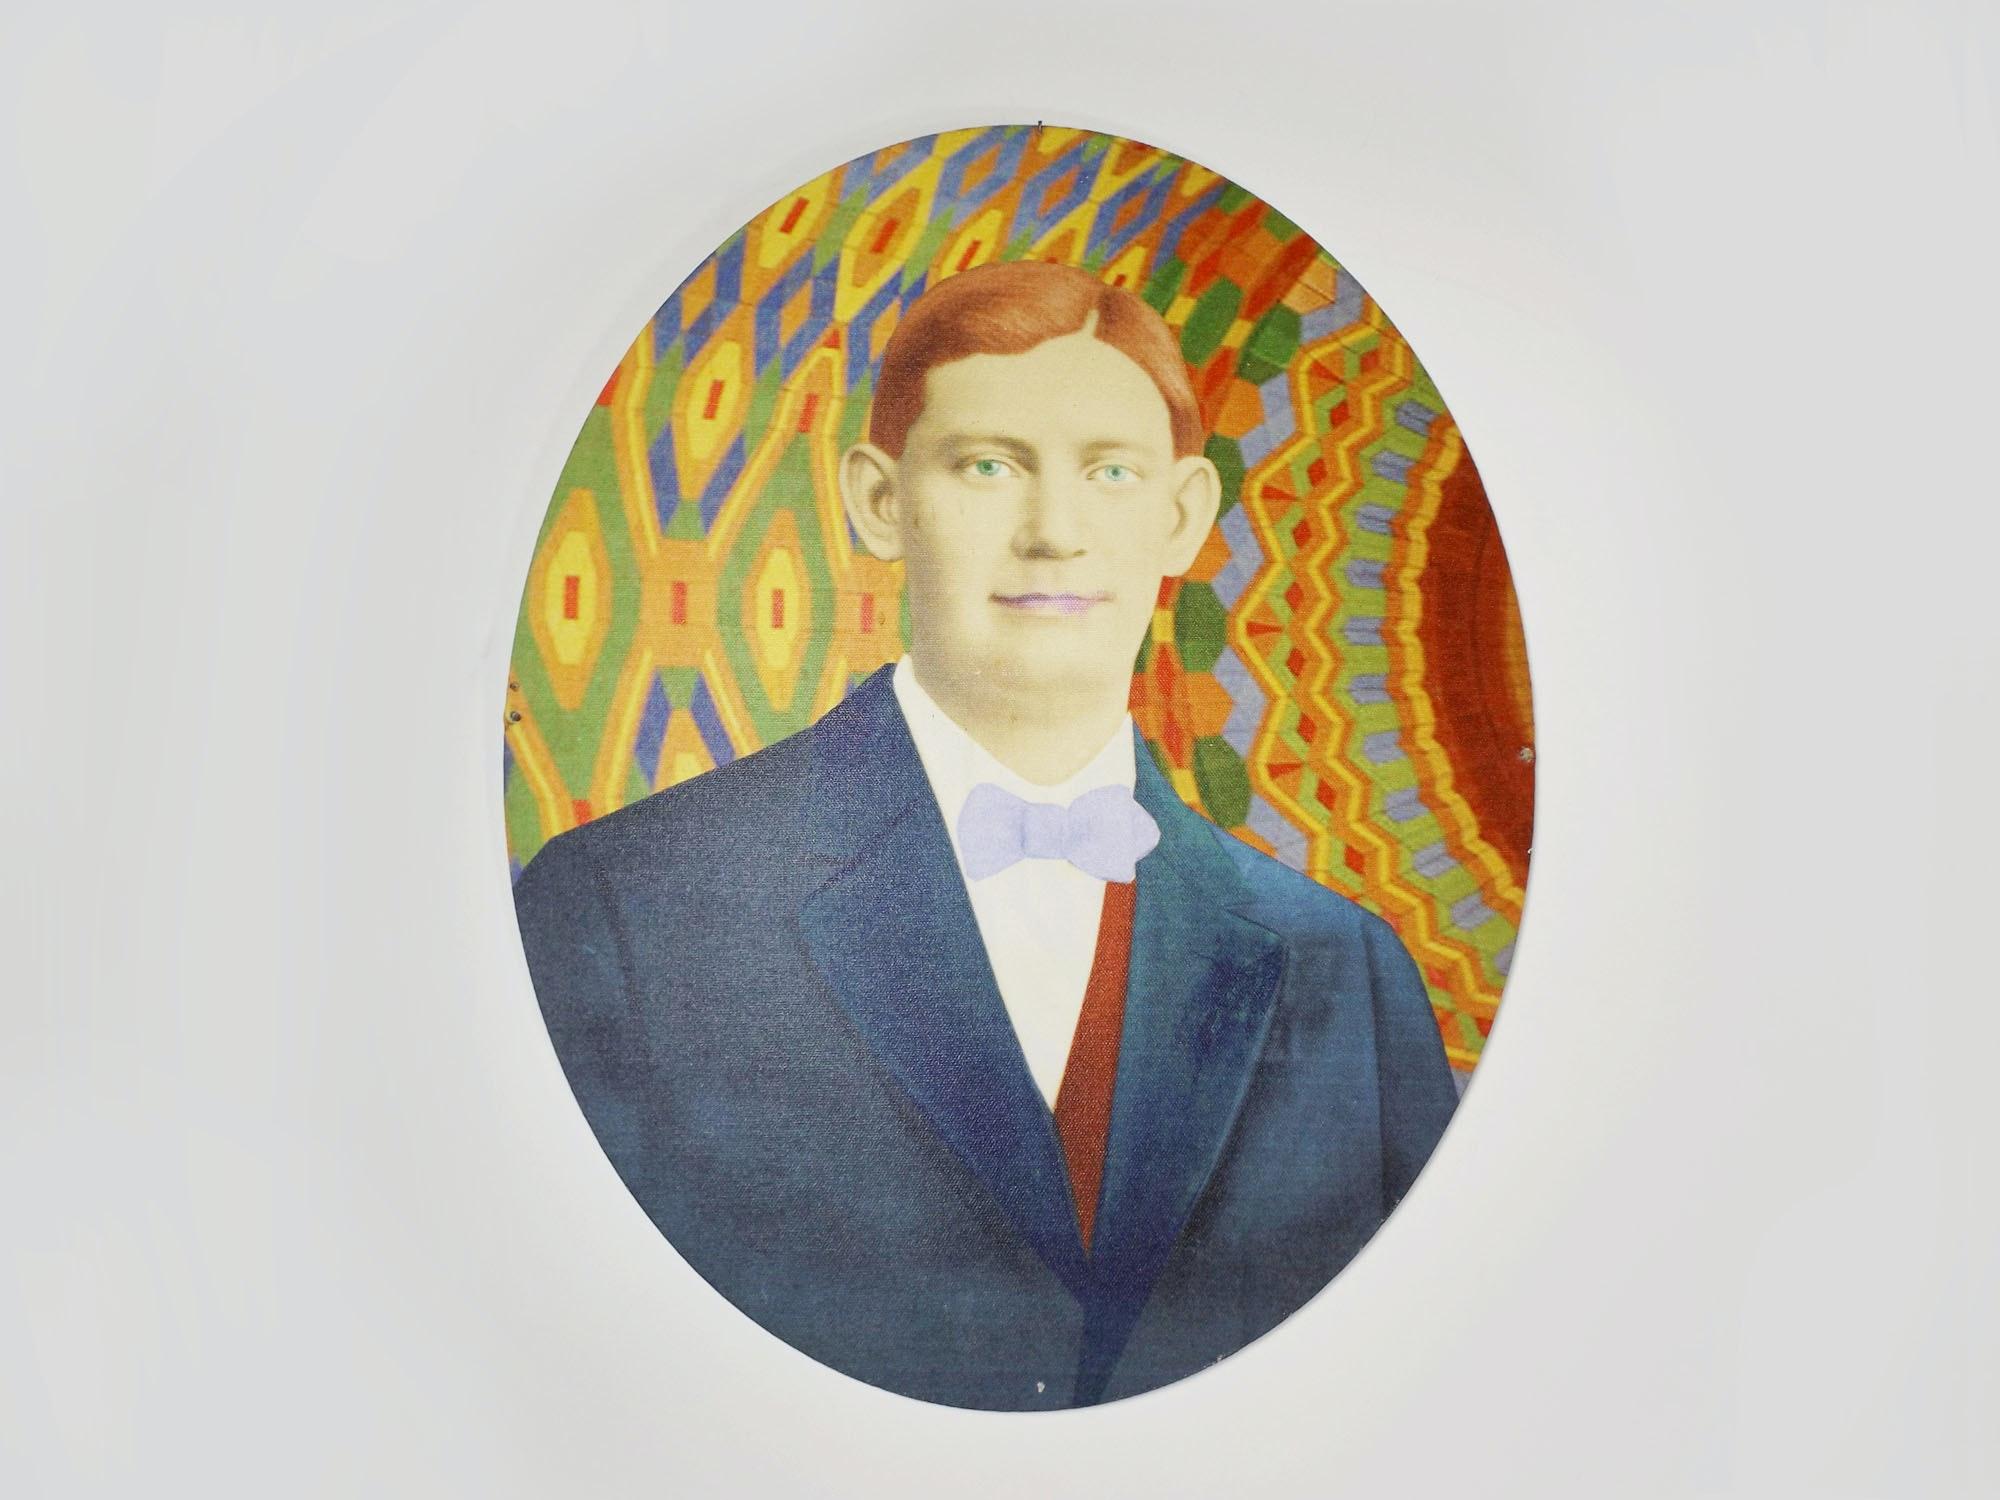 Andrew VanSickle Original 'Frank Baron' Portrait on Canvas